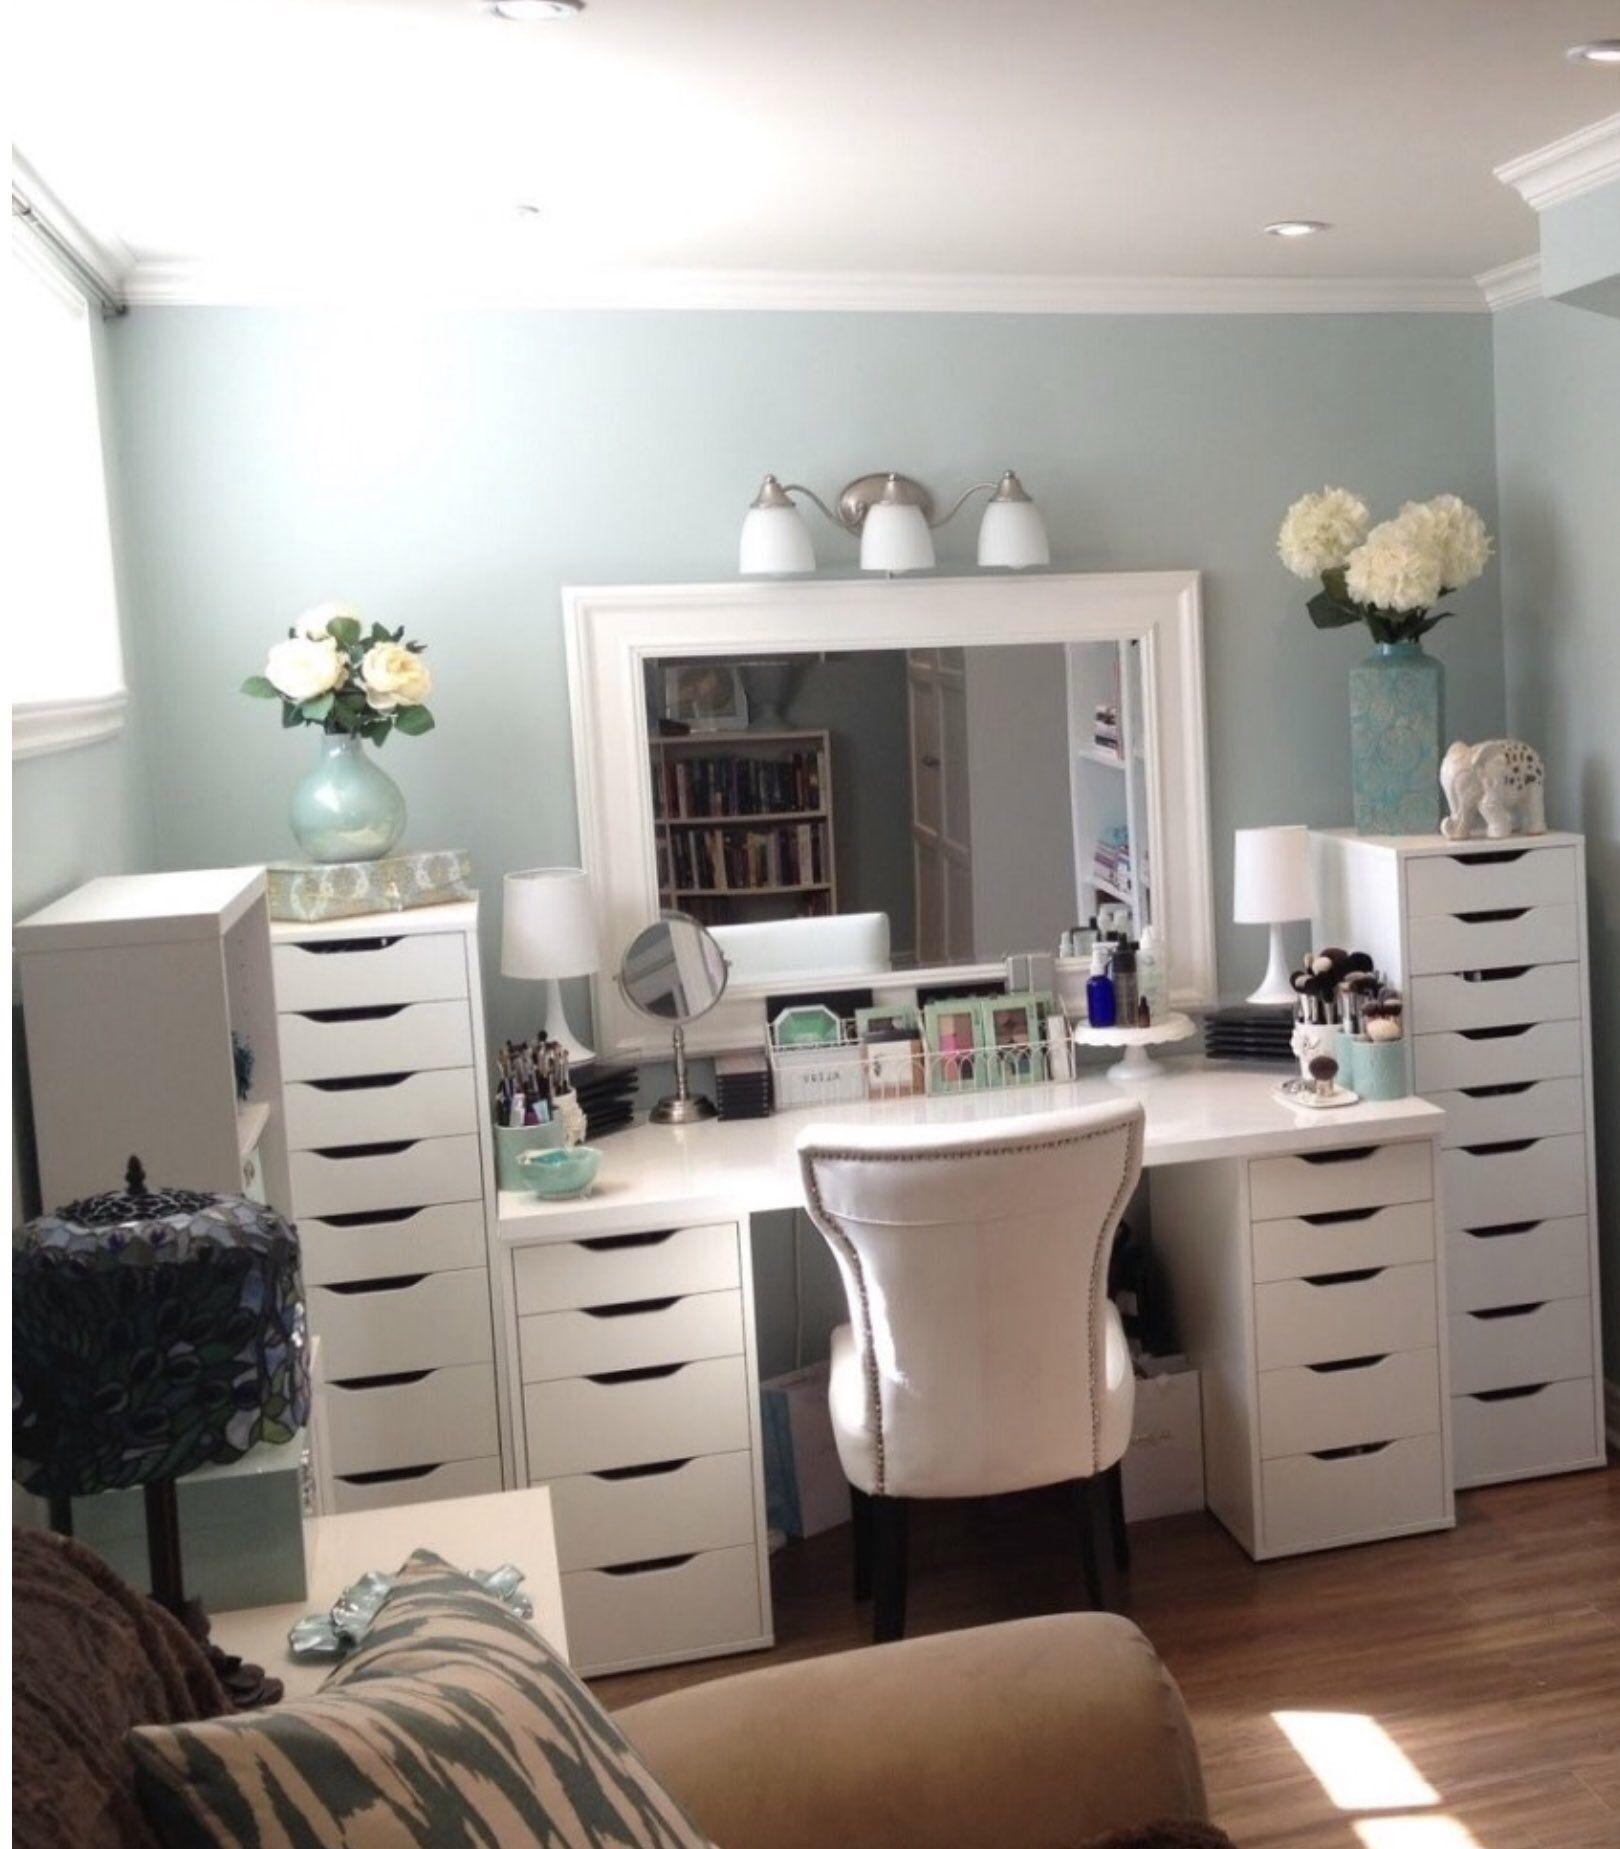 Https Www Instagram Com Sonnycosmetics Sonnycosmetics Love This Vanity Set Up So Serene Bedroom Vanity Set White Bedroom Vanity Ikea Vanity Table